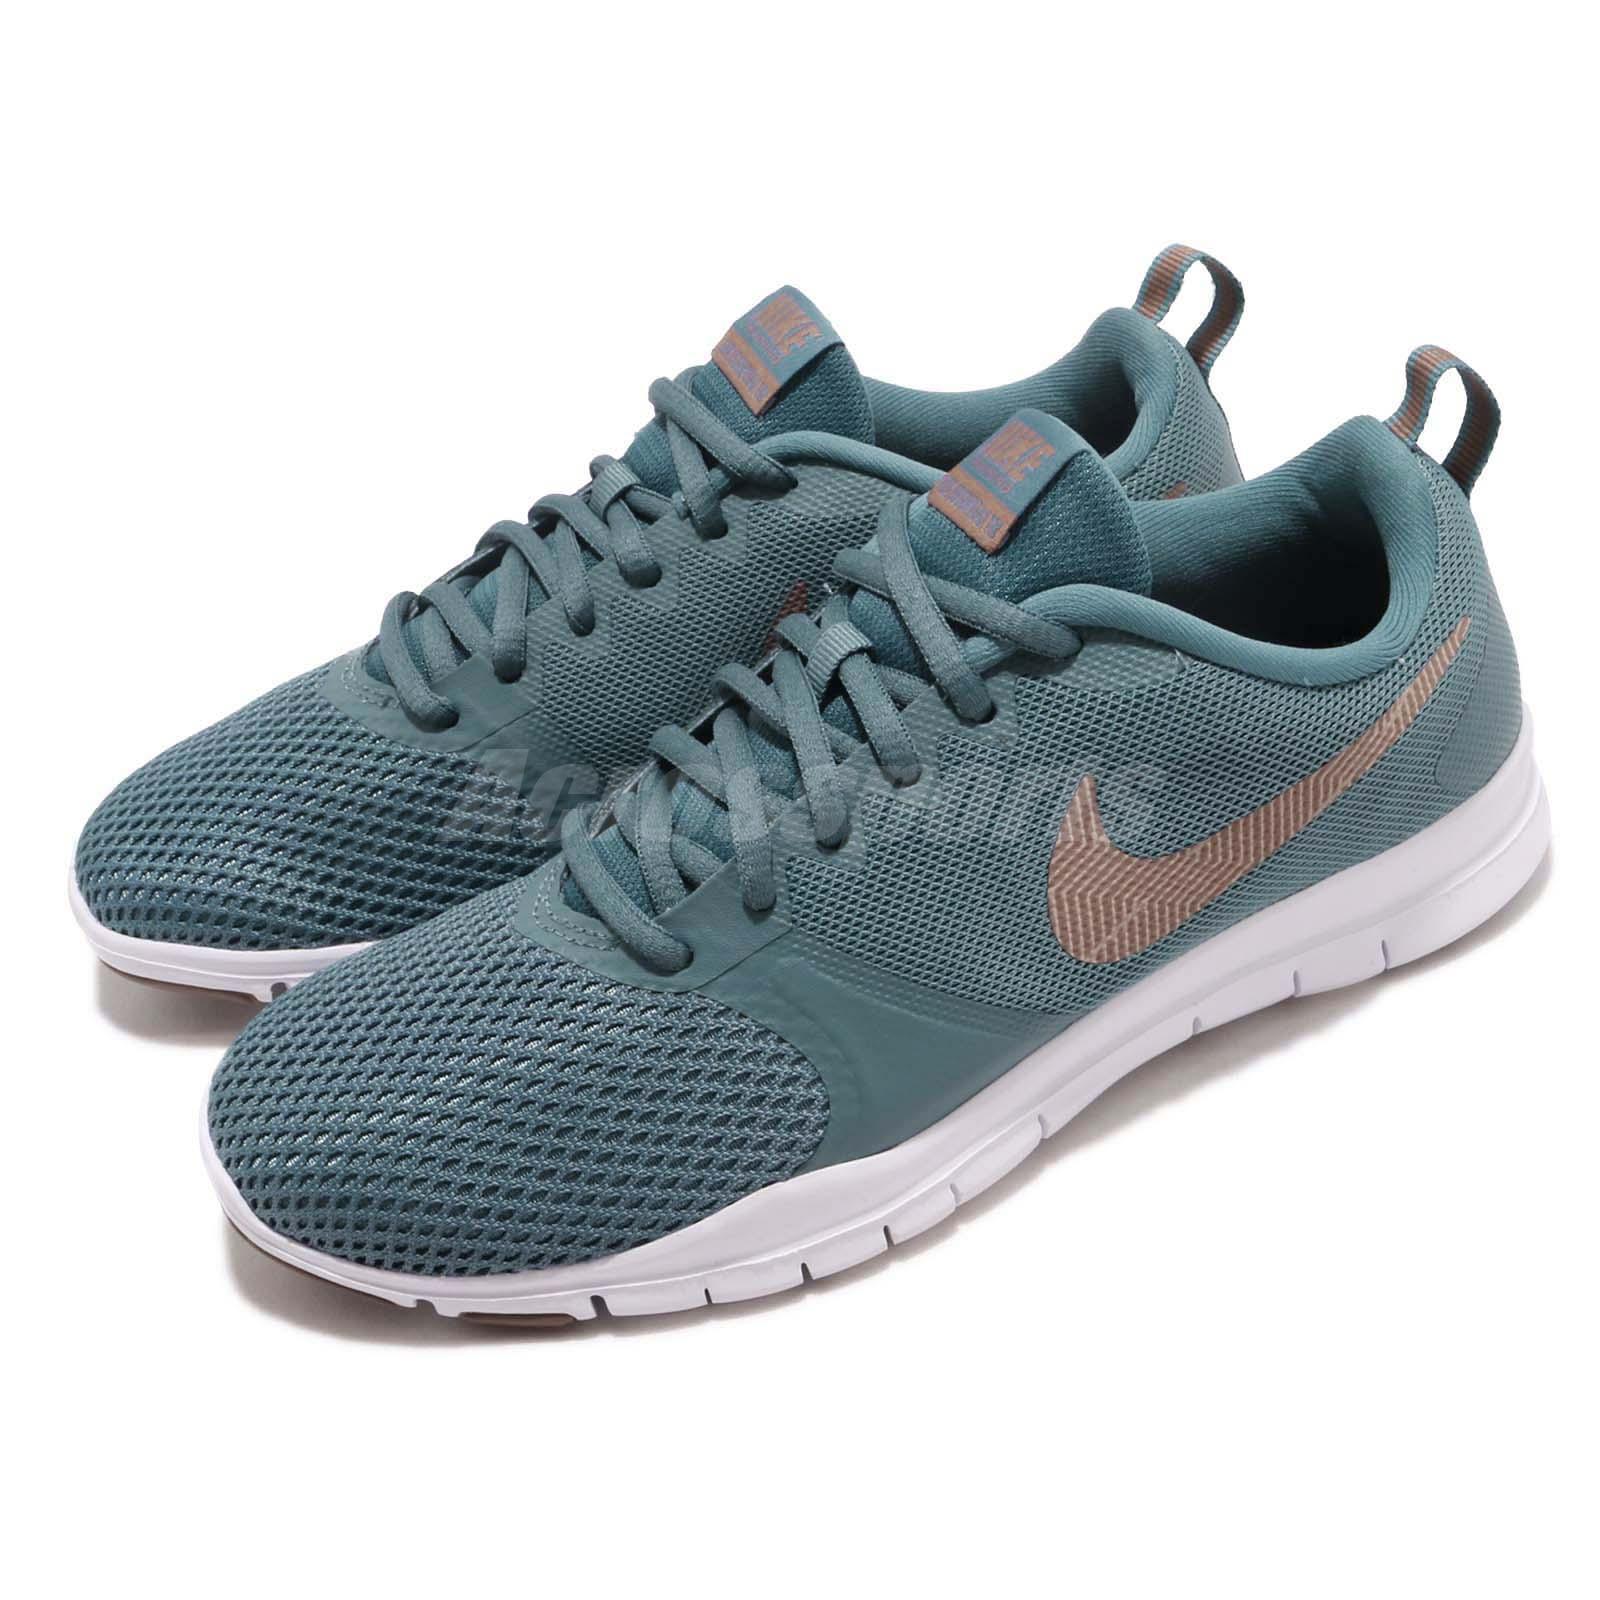 d063aabcd0 Details about Nike Wmns Flex Essential TR Celestial Teal Women Cross Training  Shoes 924344-400